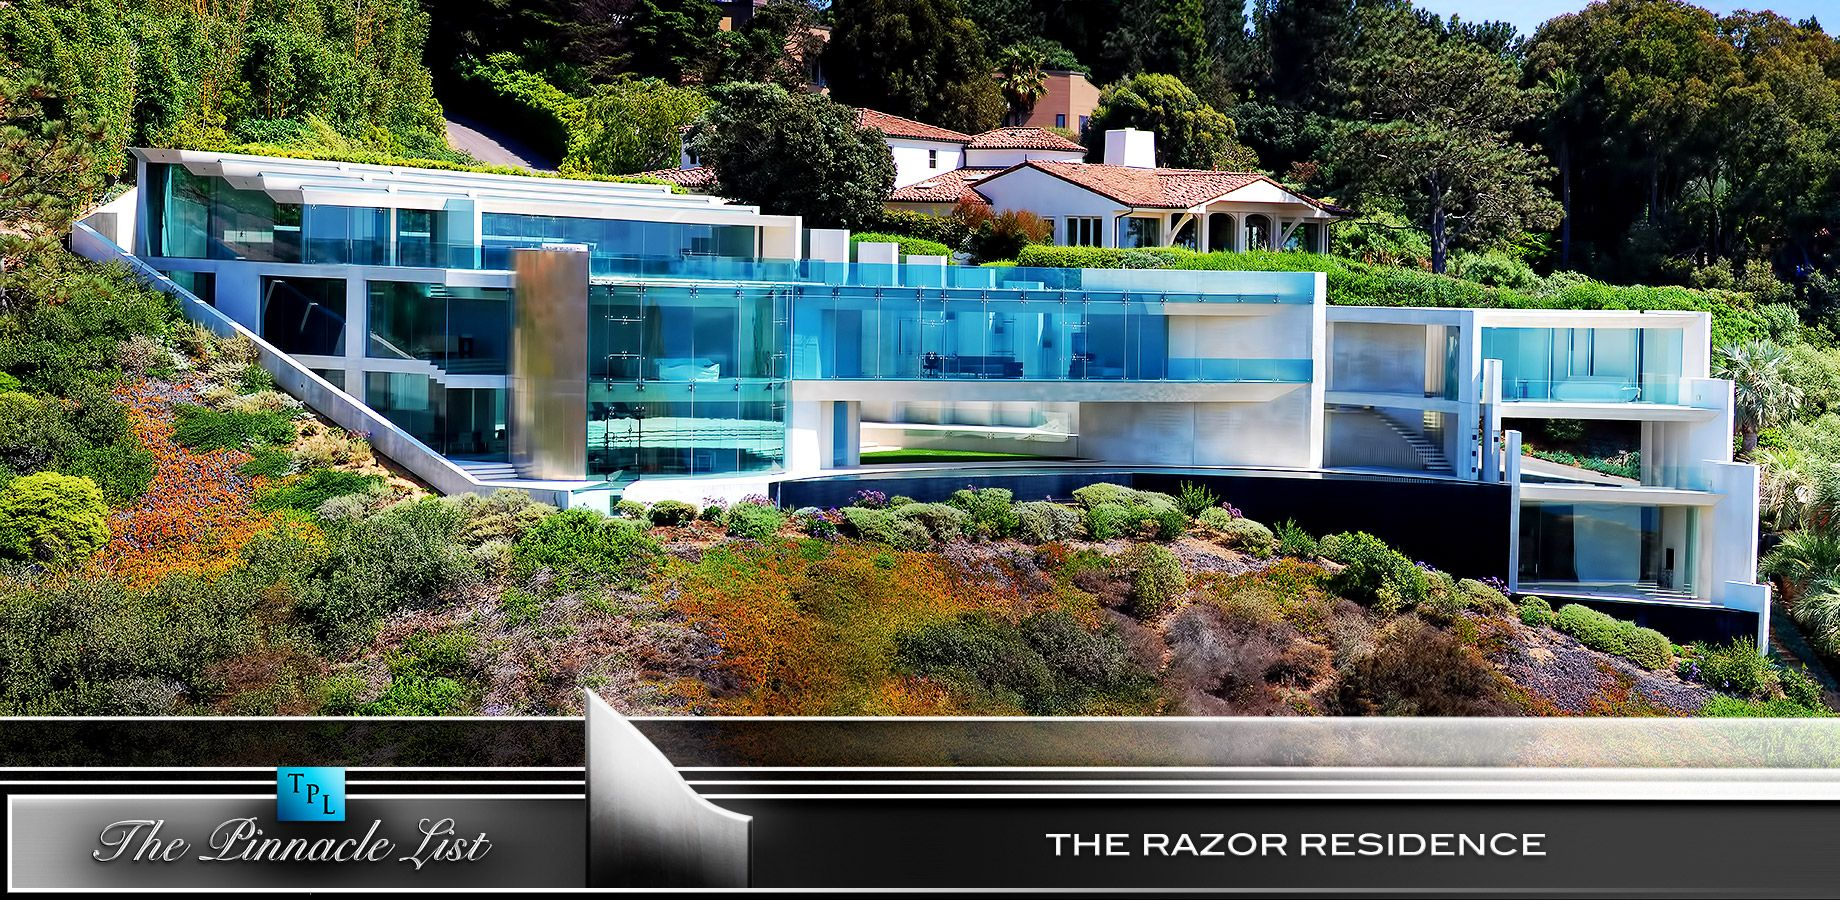 The Razor Residence 9826 La Jolla Farms Way San Diego Ca